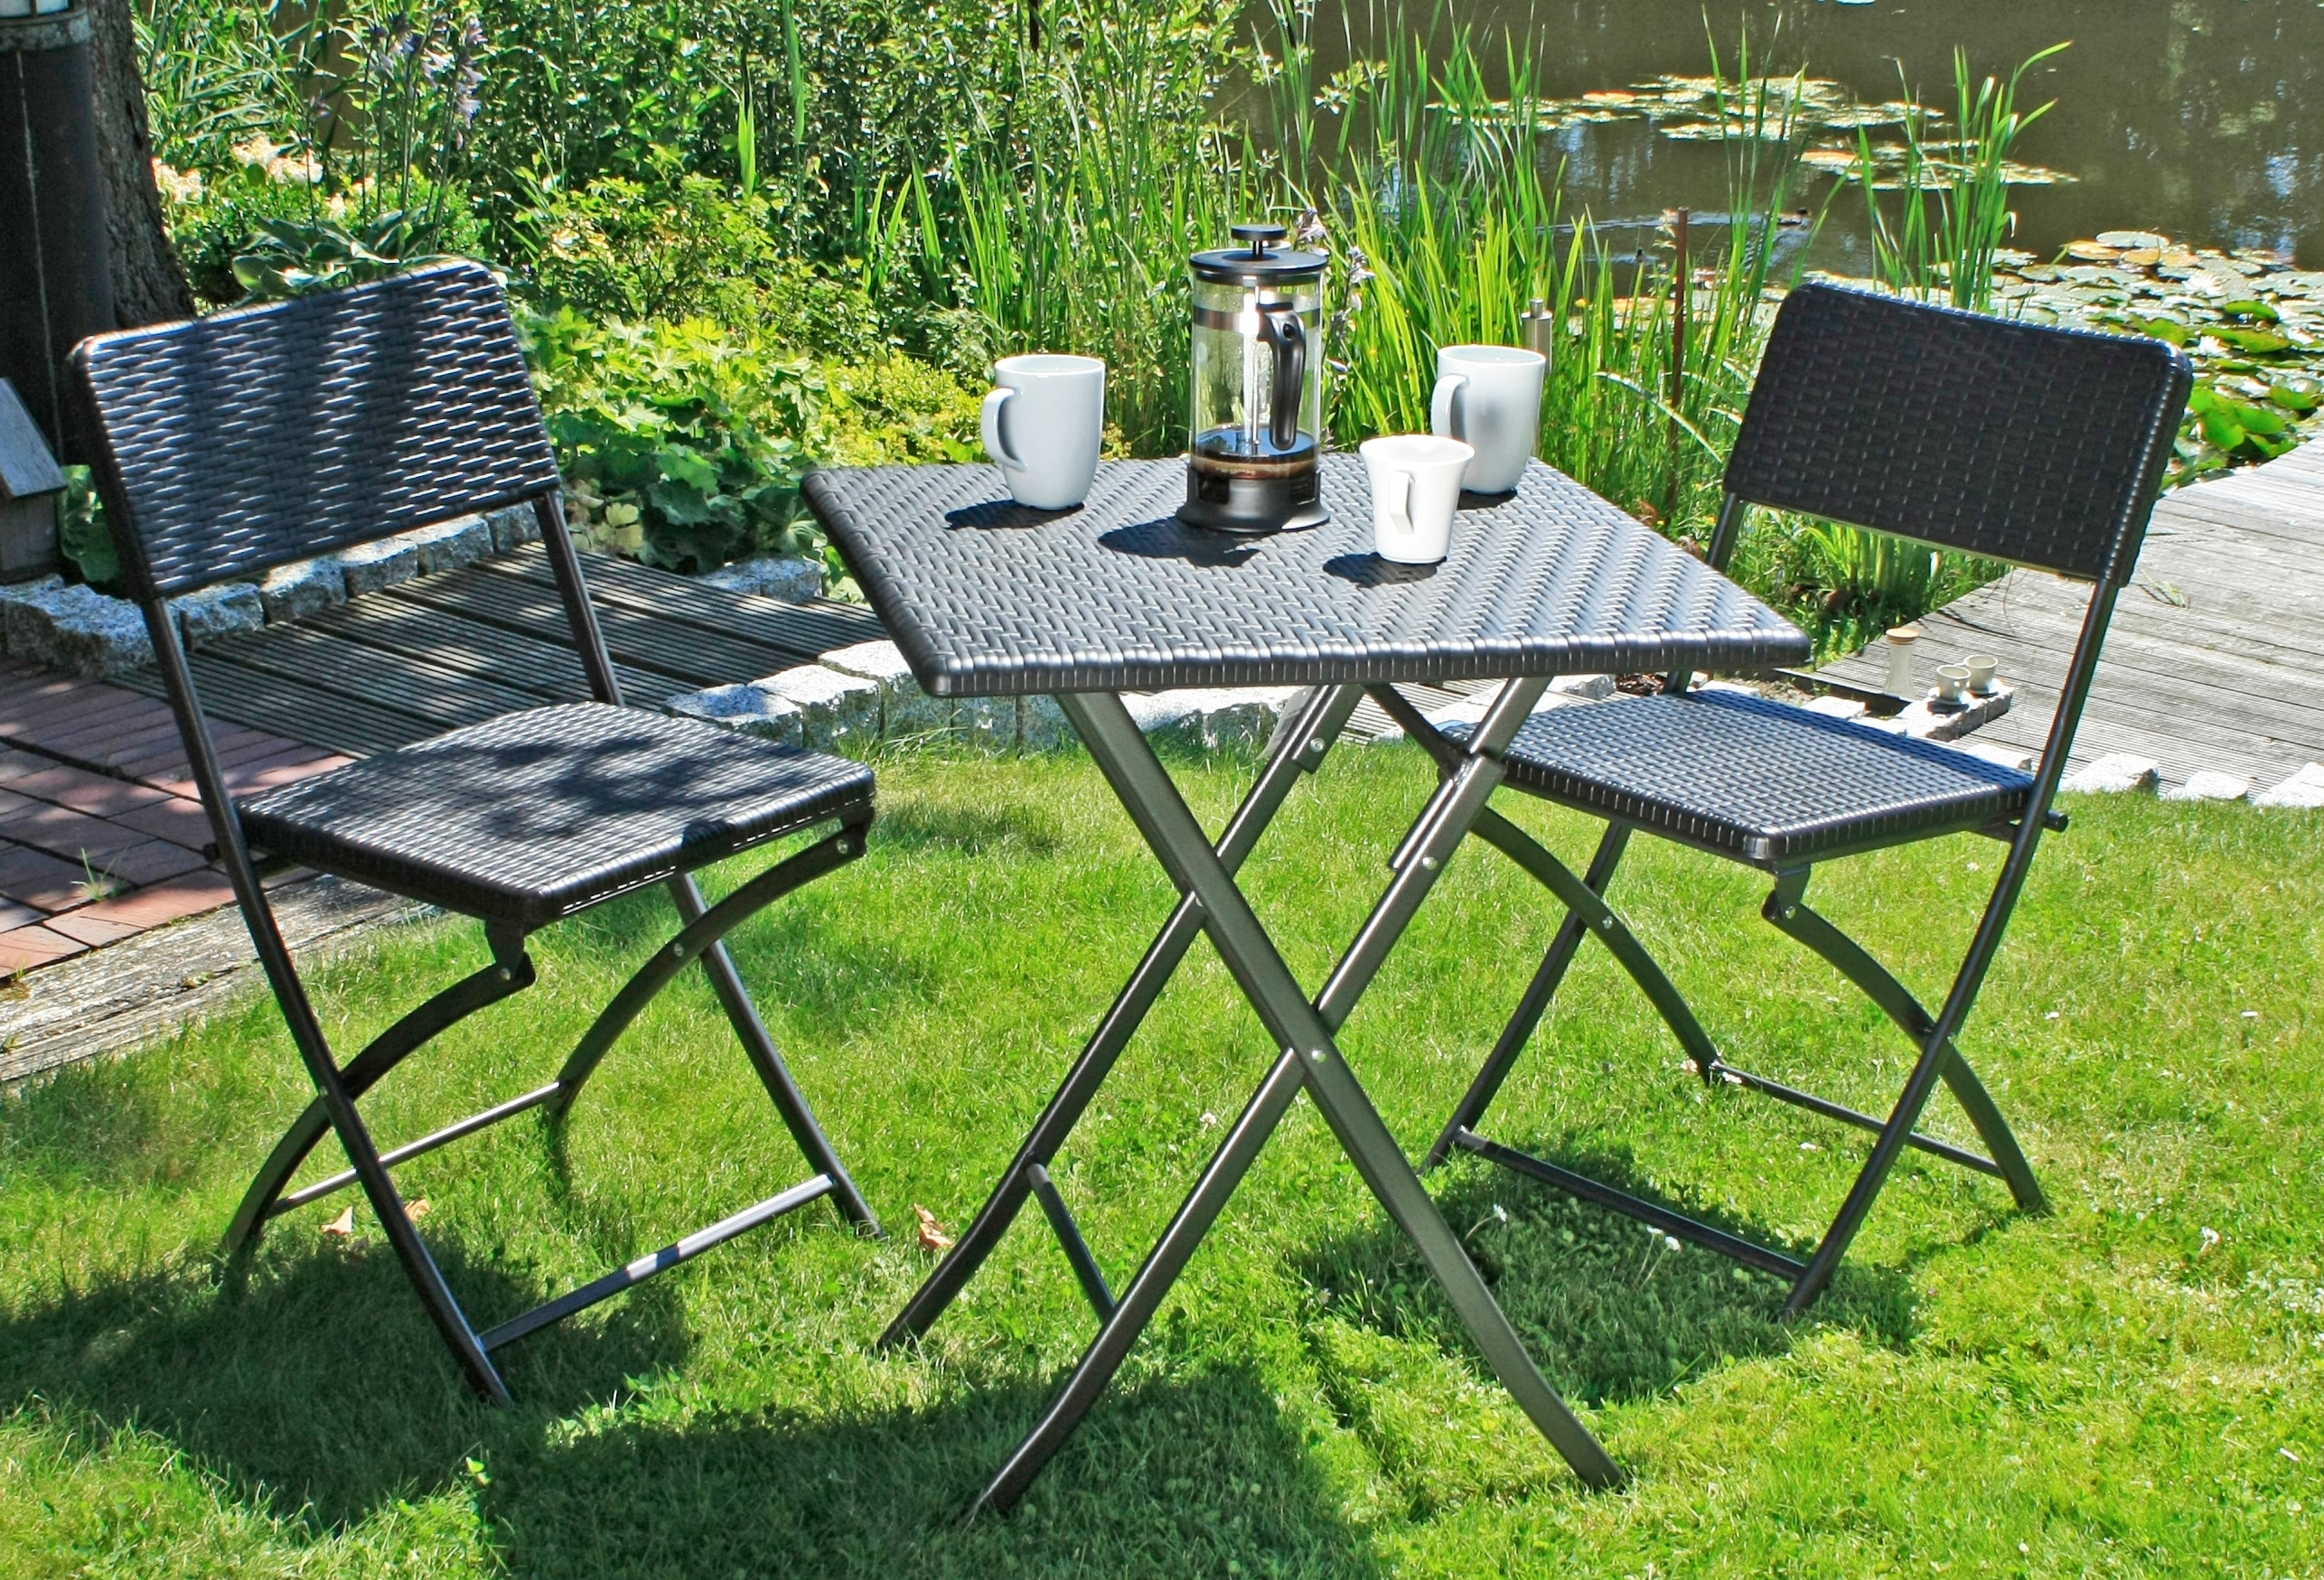 GARDEN PLEASURE Gartenmöbelset VENTANA 3-tlg 2 Stühle Tisch klappbar Kunststoff